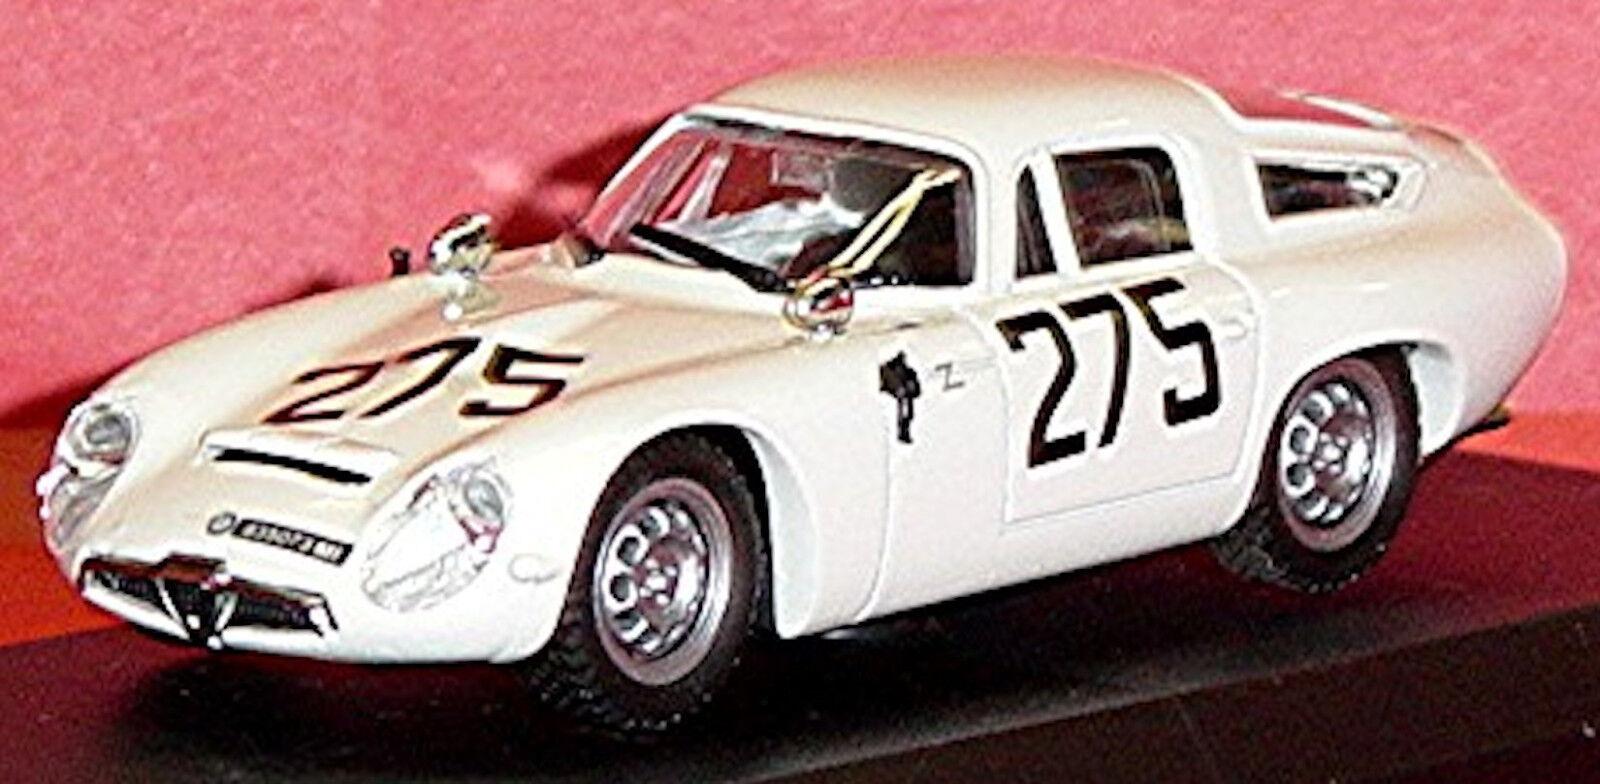 ALFA ROMEO TZ 1 1 1 MONZA 1963 #275 BLANC BLANC 1:43 Best 2d220c